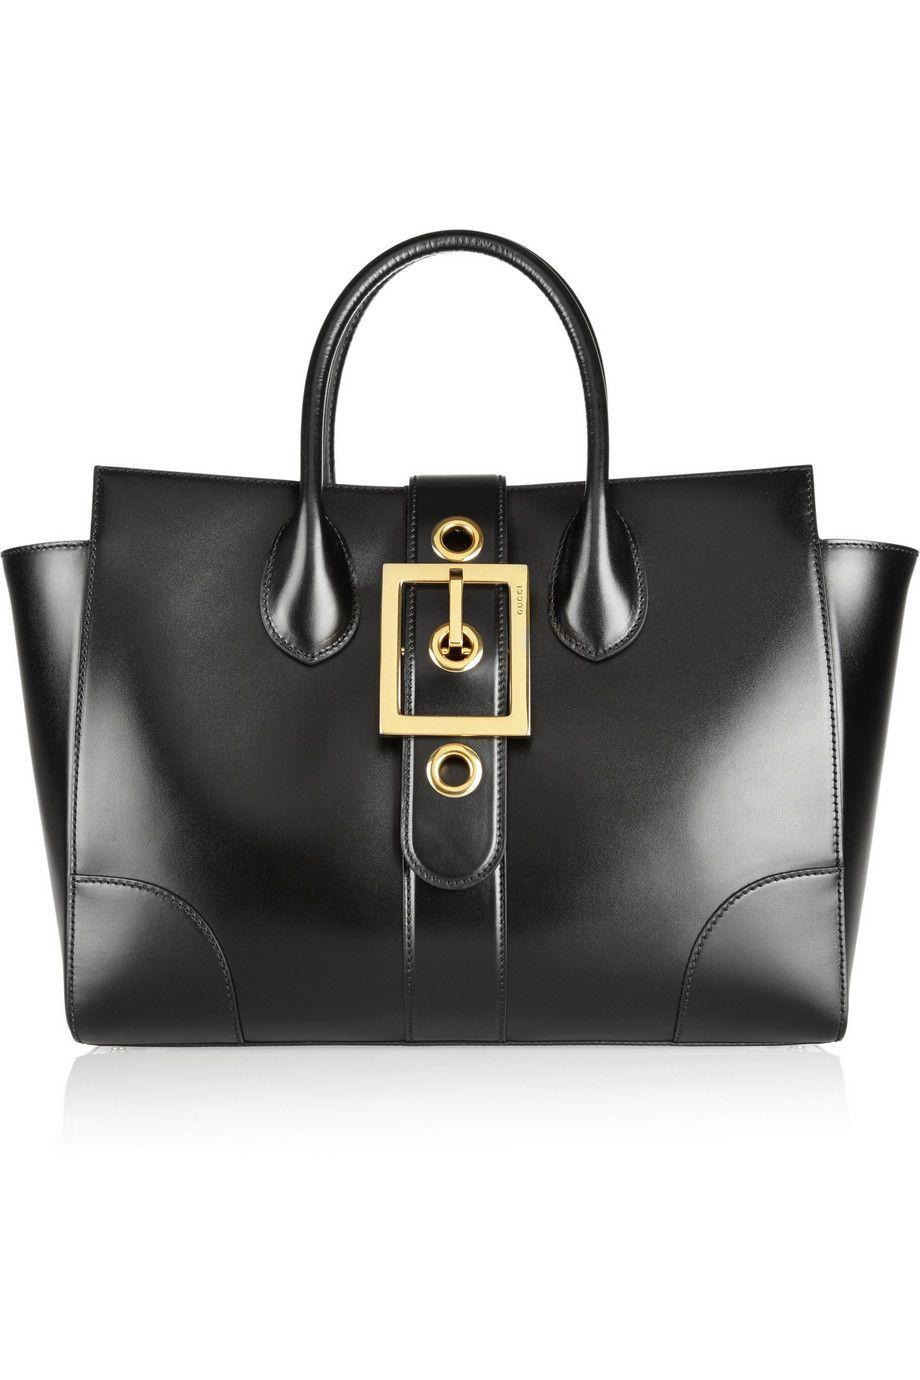 Gucci | Buckle-detailed leather trapeze bag | NET-A-PORTER.COM